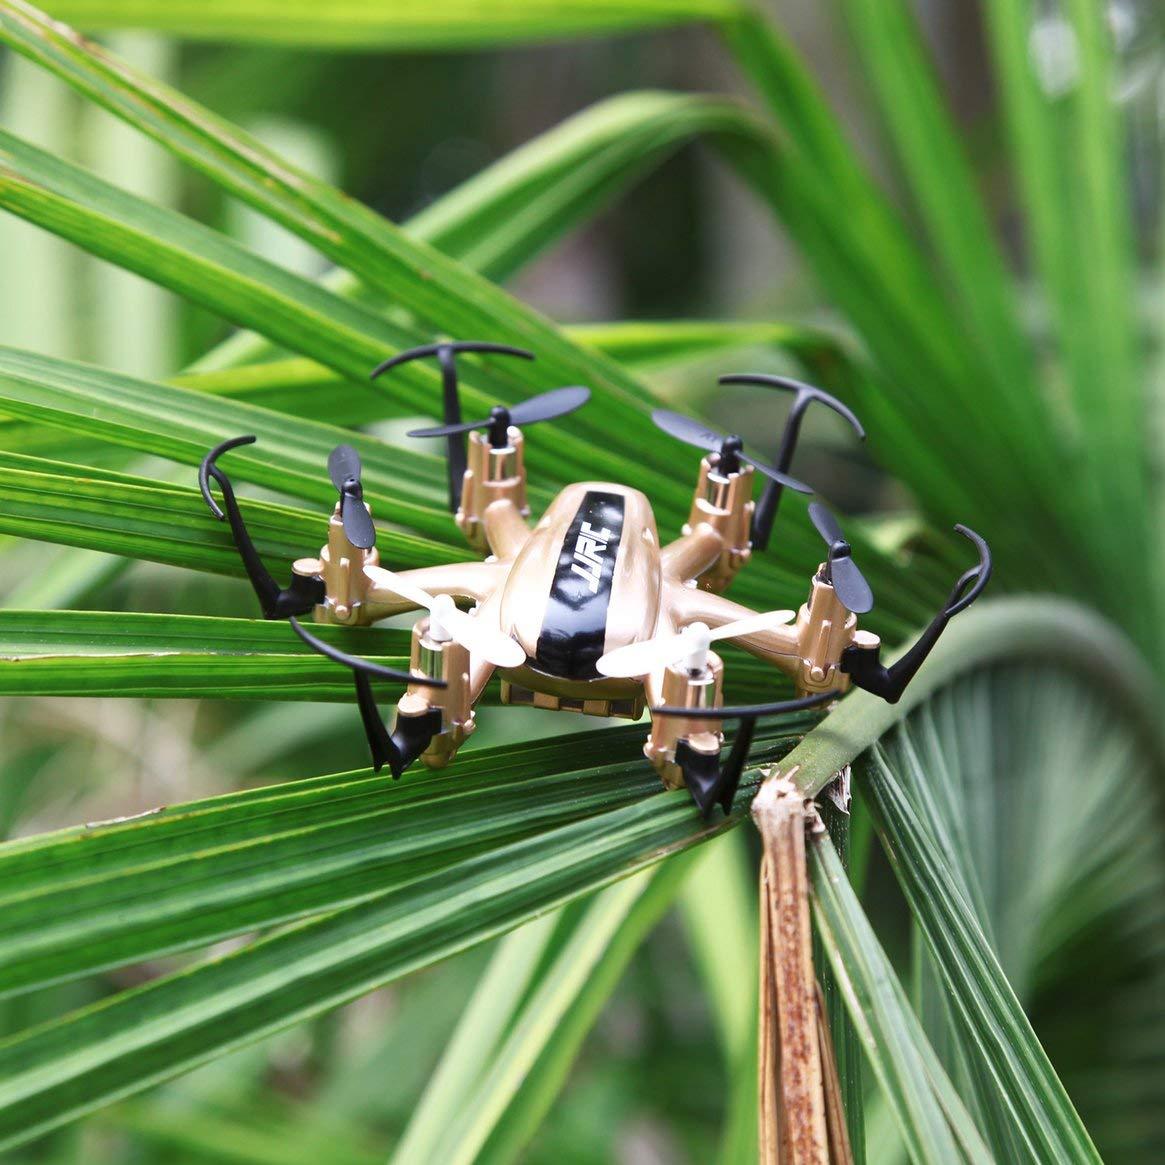 JJRC H20 Mini Drone Dubai UAE